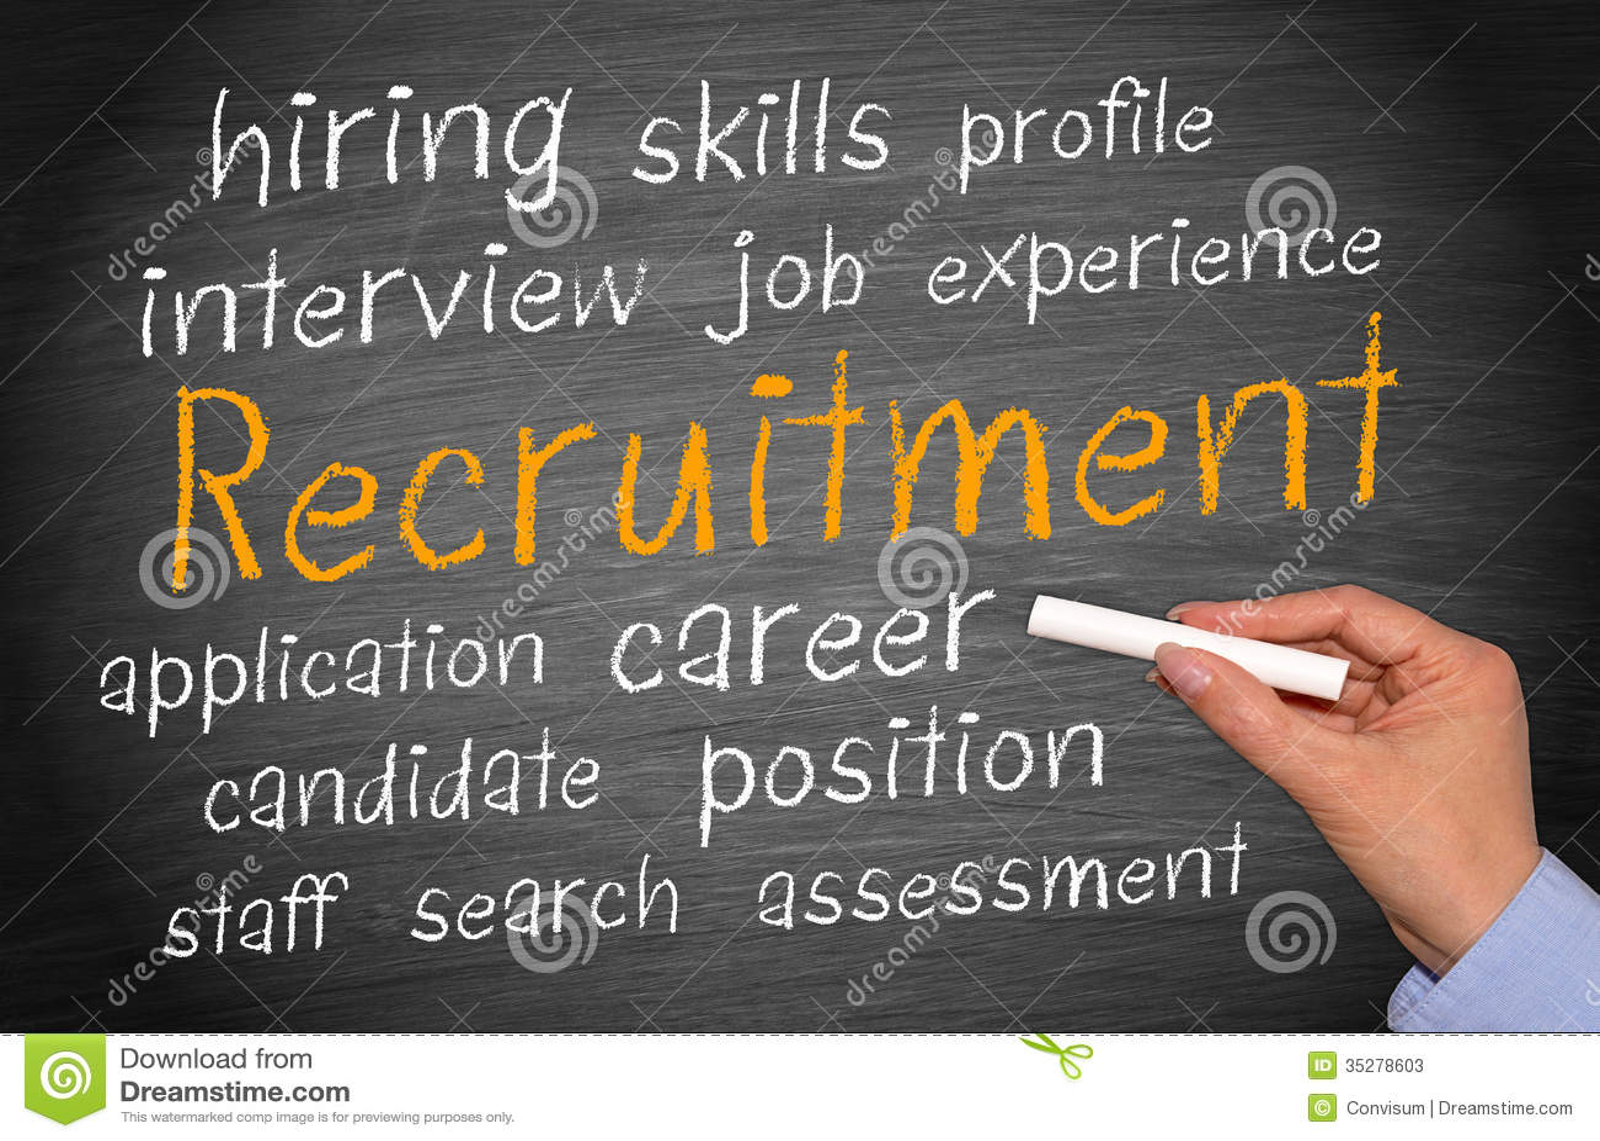 fancy job skills resume writing with skills resume list list of